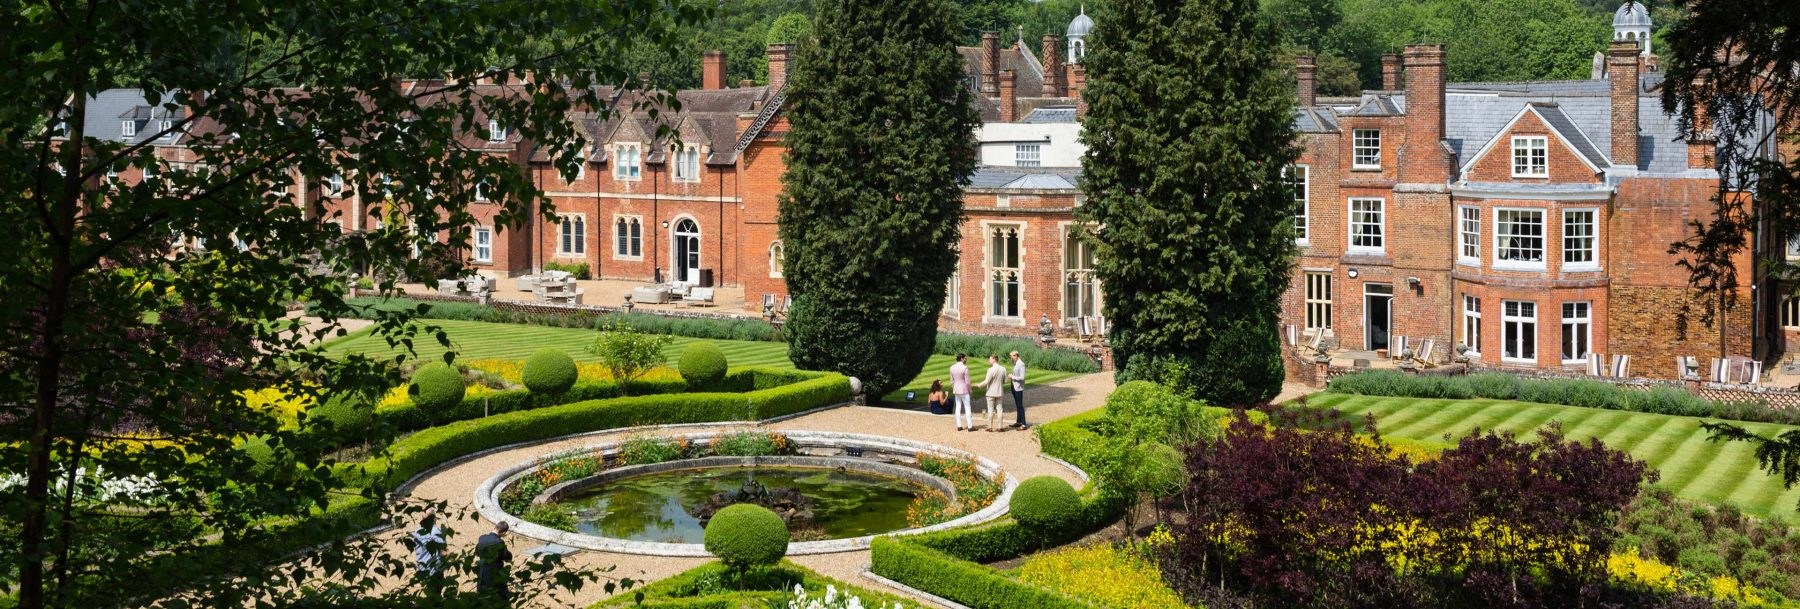 The Wotton House Italian gardens